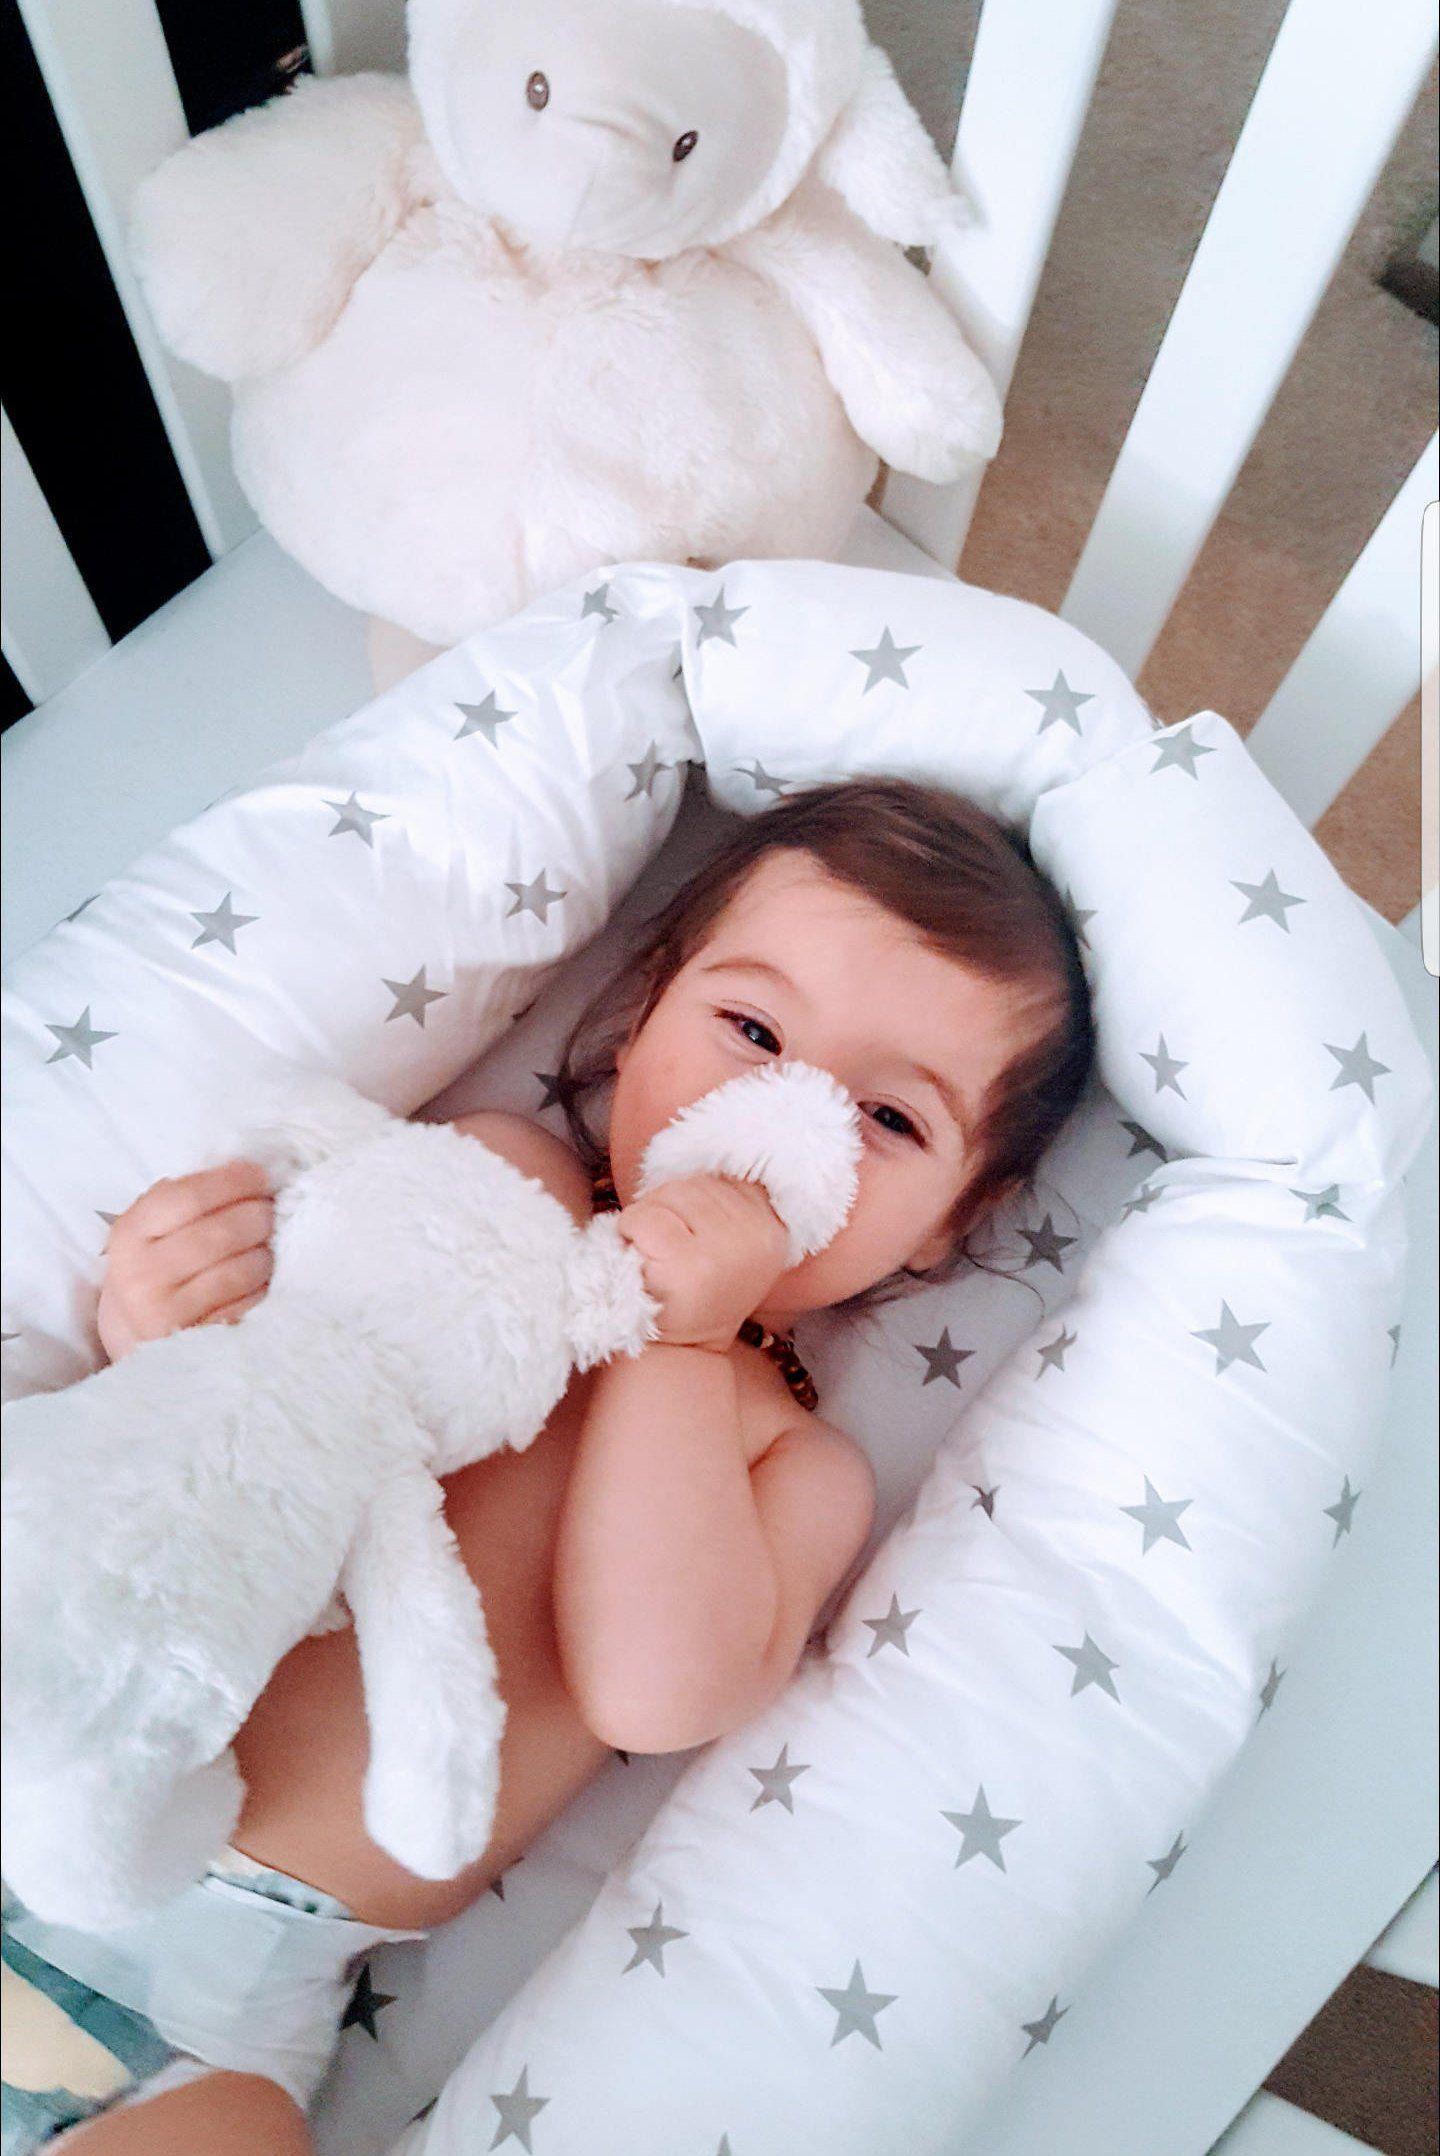 Babynest Toddler Size Nest With Removable Cover Travel Cot Babynest Portable Crib Lounger Nest Baby Bassinet Sleep Nest Co Sleeper By Babynestshop O Criancas